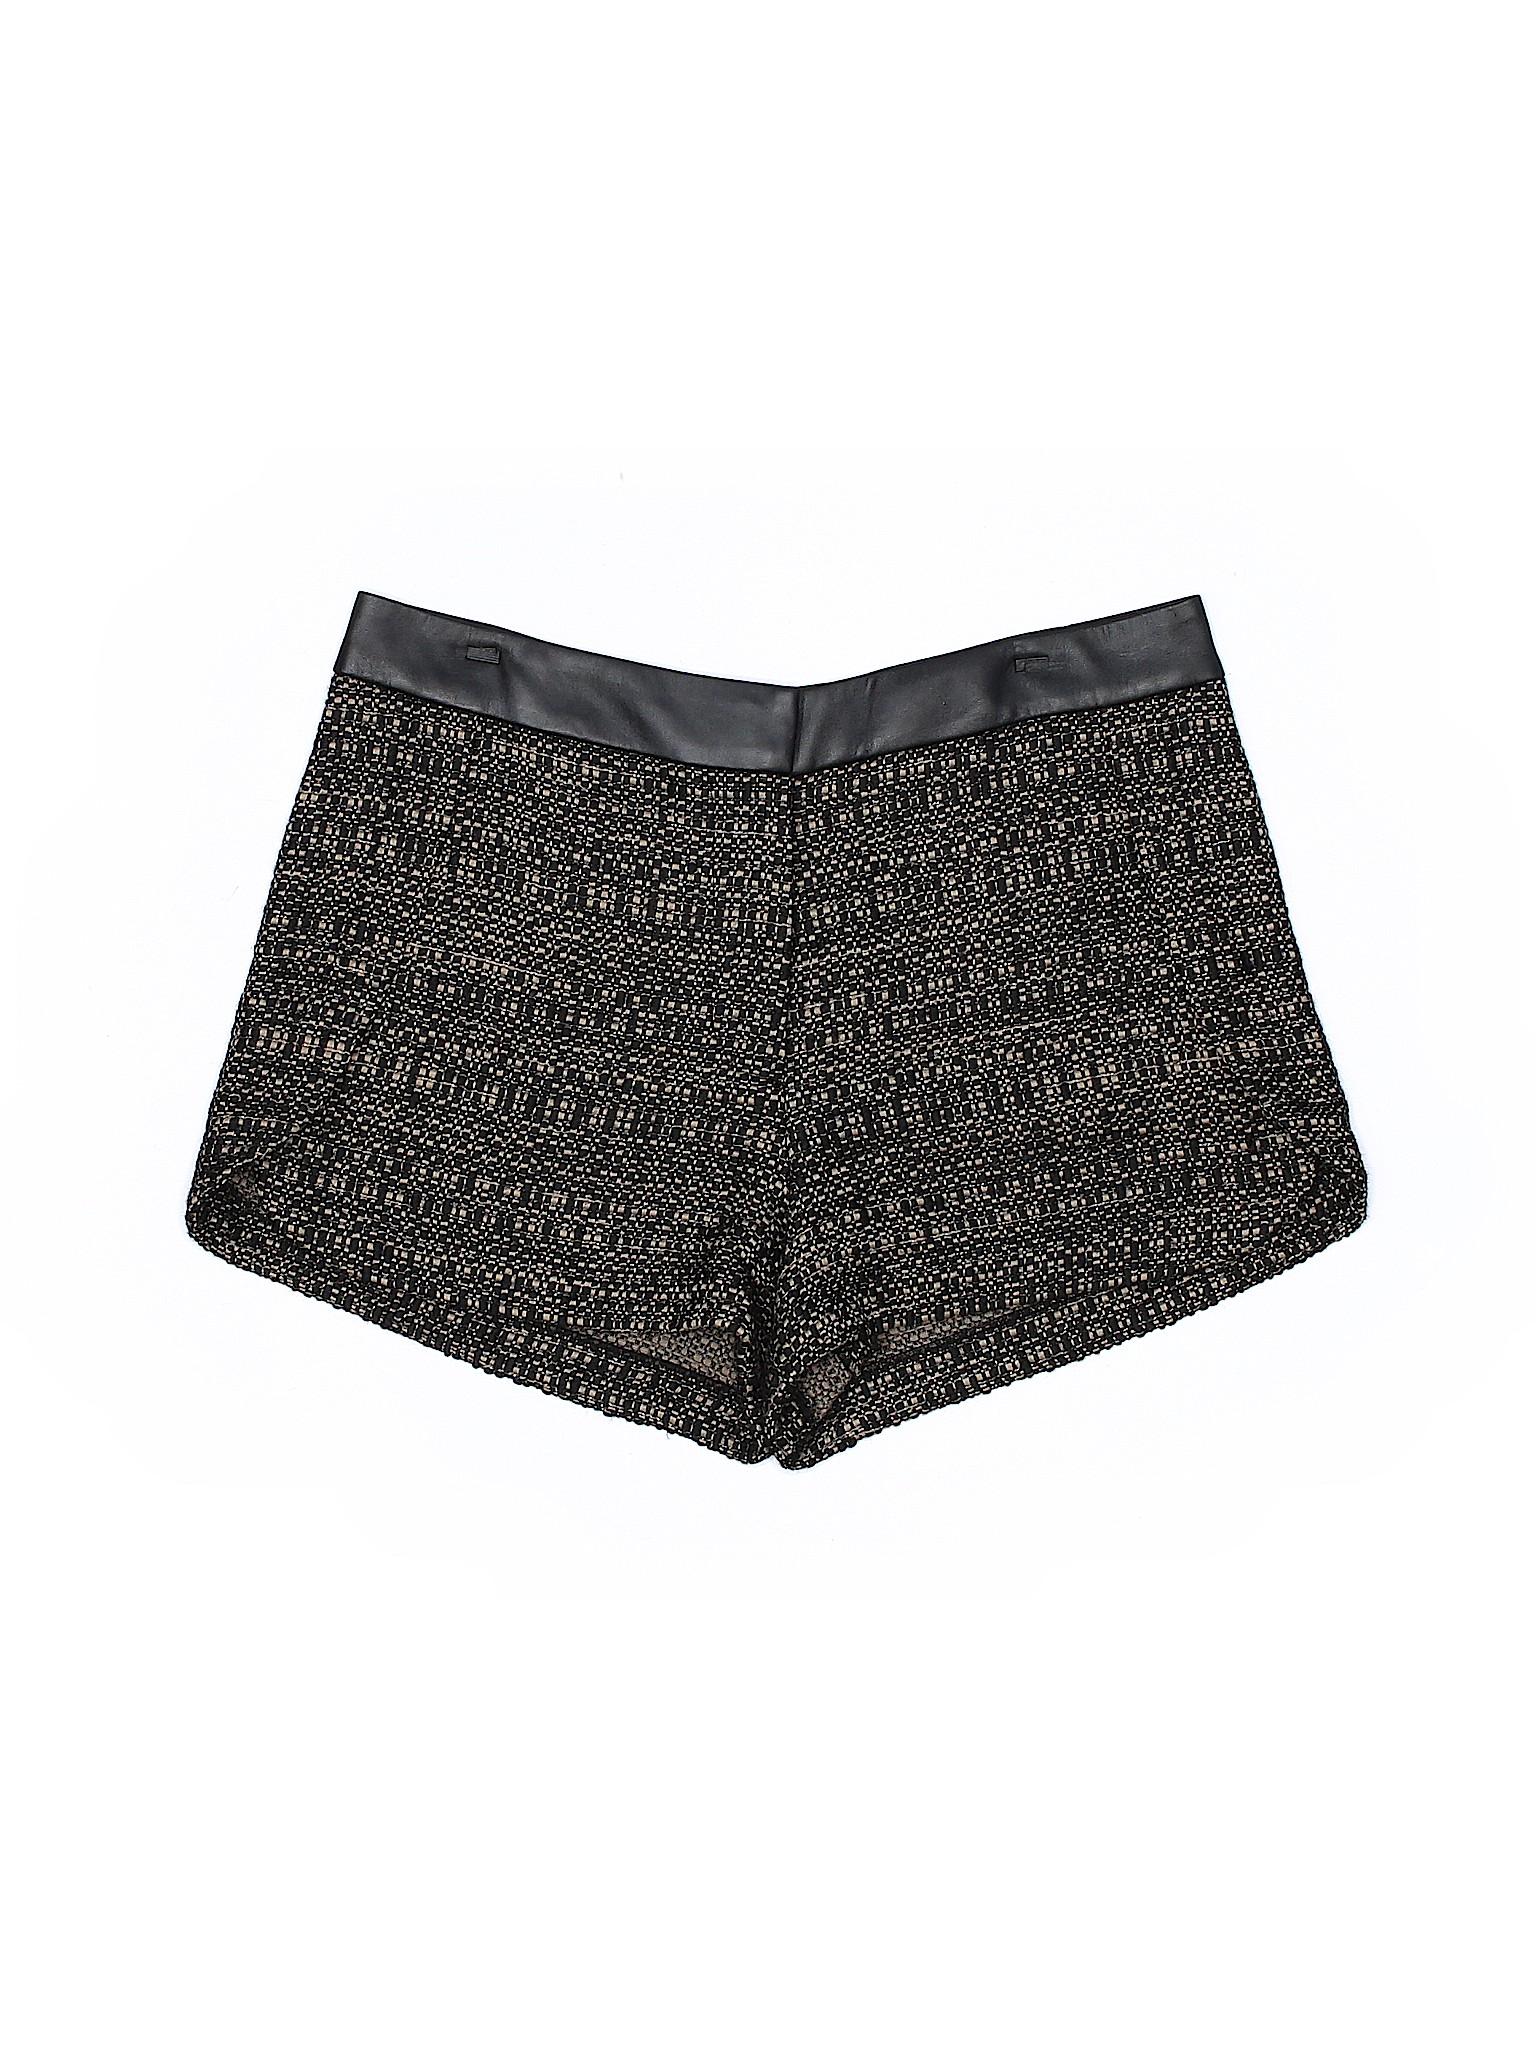 Shorts leisure Dressy Boutique Robert Rodriguez OpqnX4